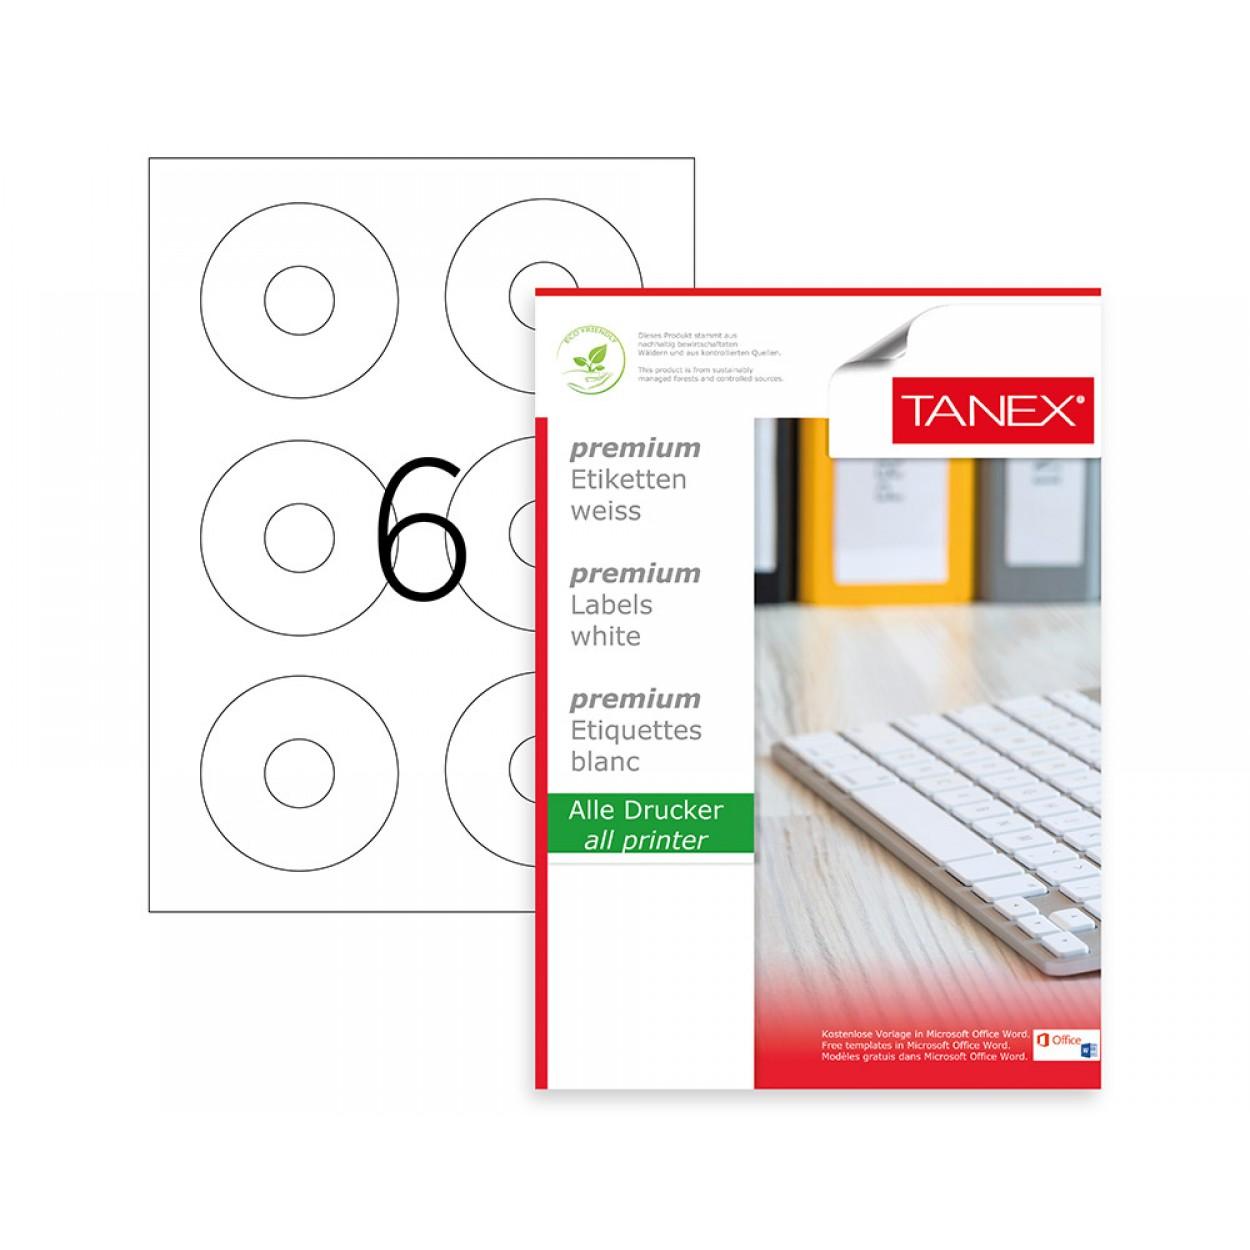 Tanex TW-2506 79x20mm Kuşe Lazer Etiket 100 Lü Paket